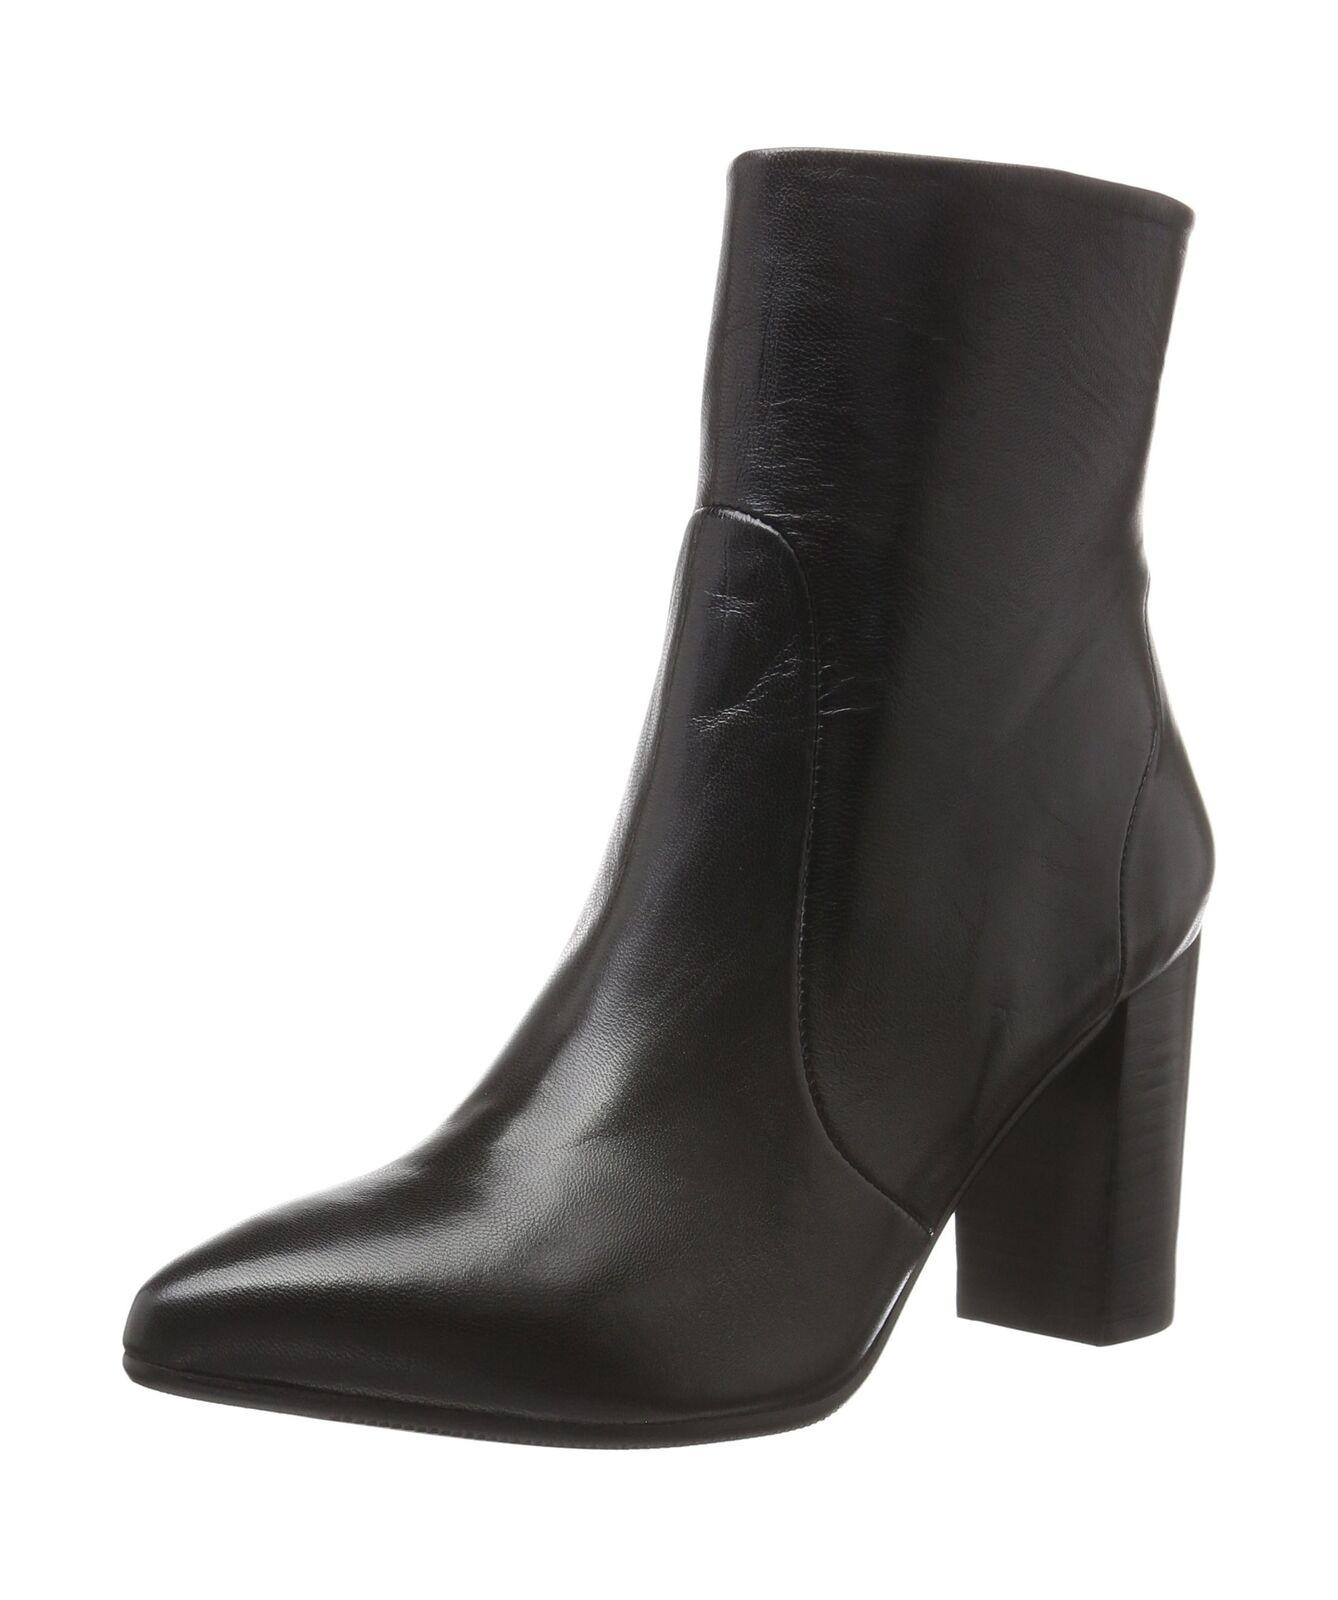 Buffalo para mujer es 30757 Mestico Tobillo Botas Negro (Preto 01) 7 Reino Unido